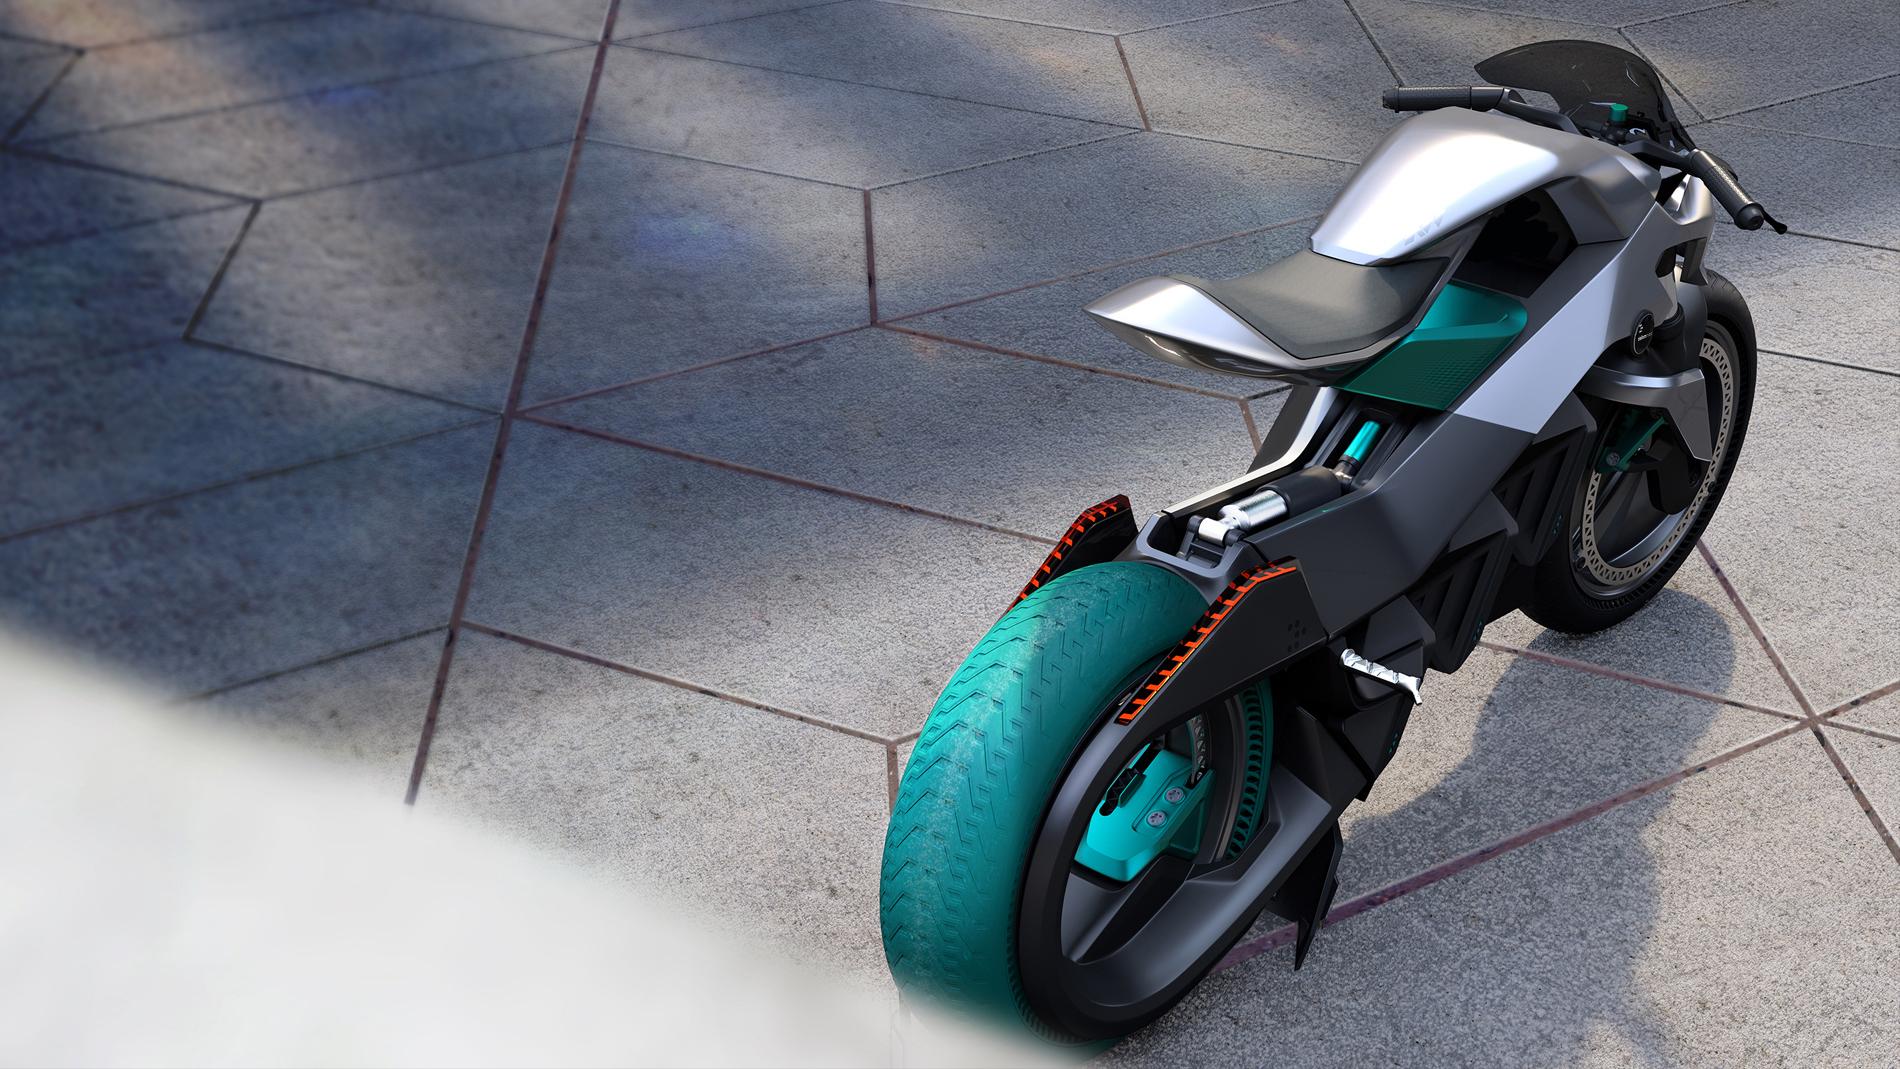 grey black green motorbike on asphalt back top view